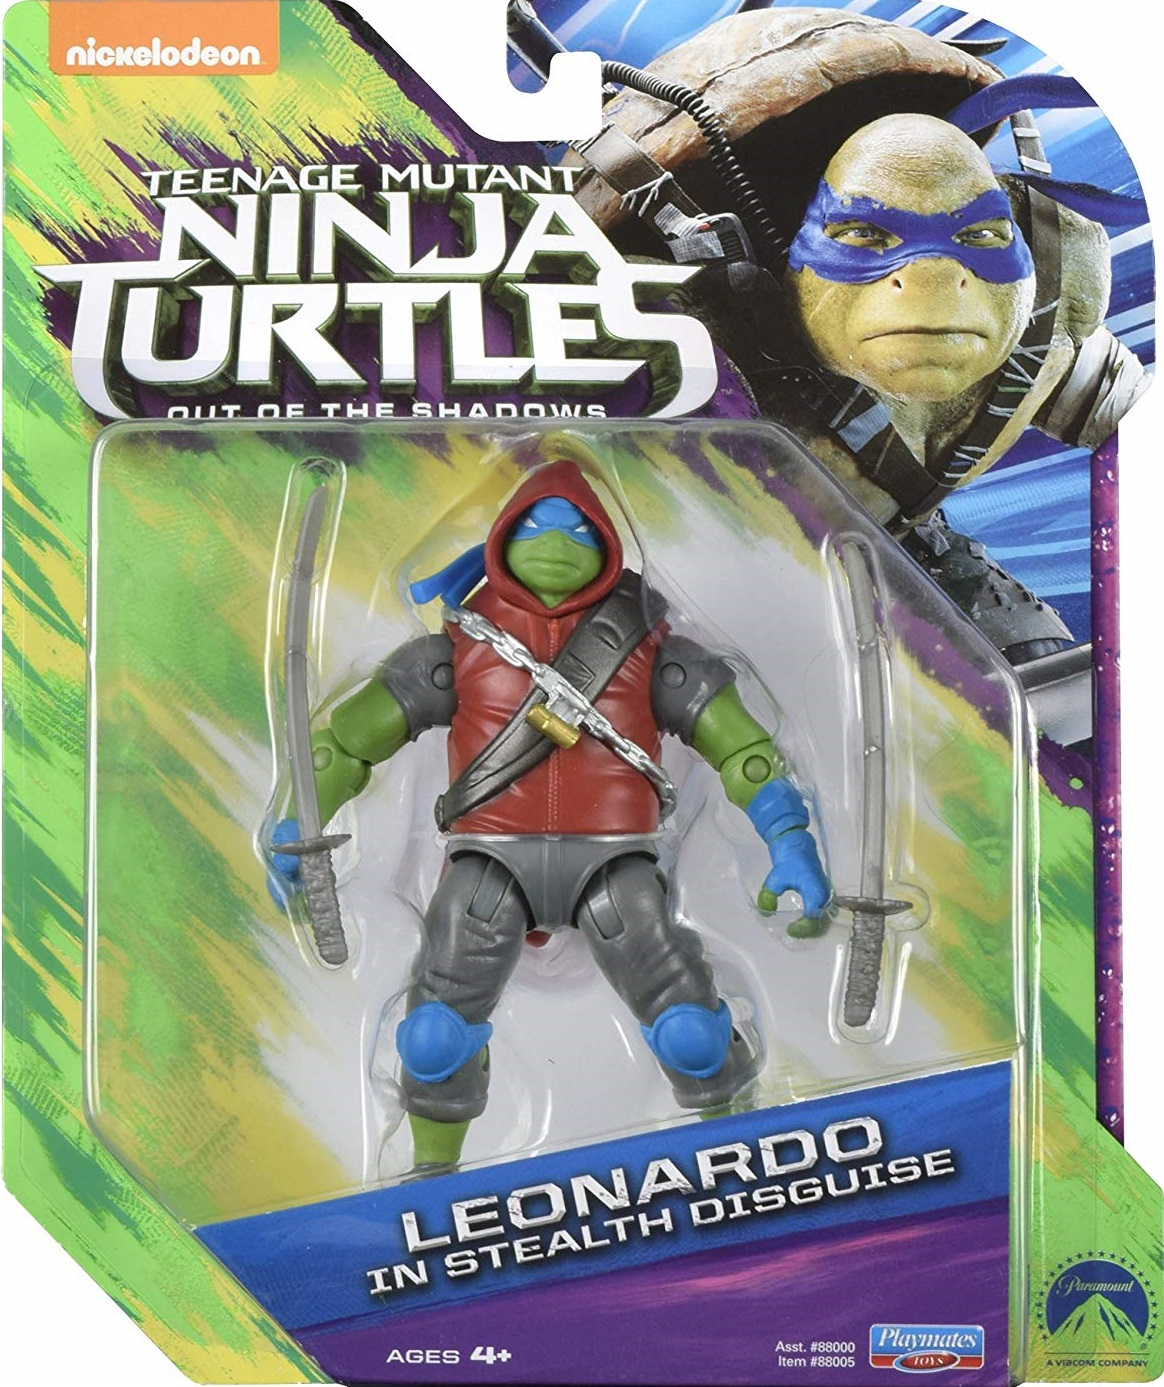 Leonardo Stealth Disguise (2016 action figure)